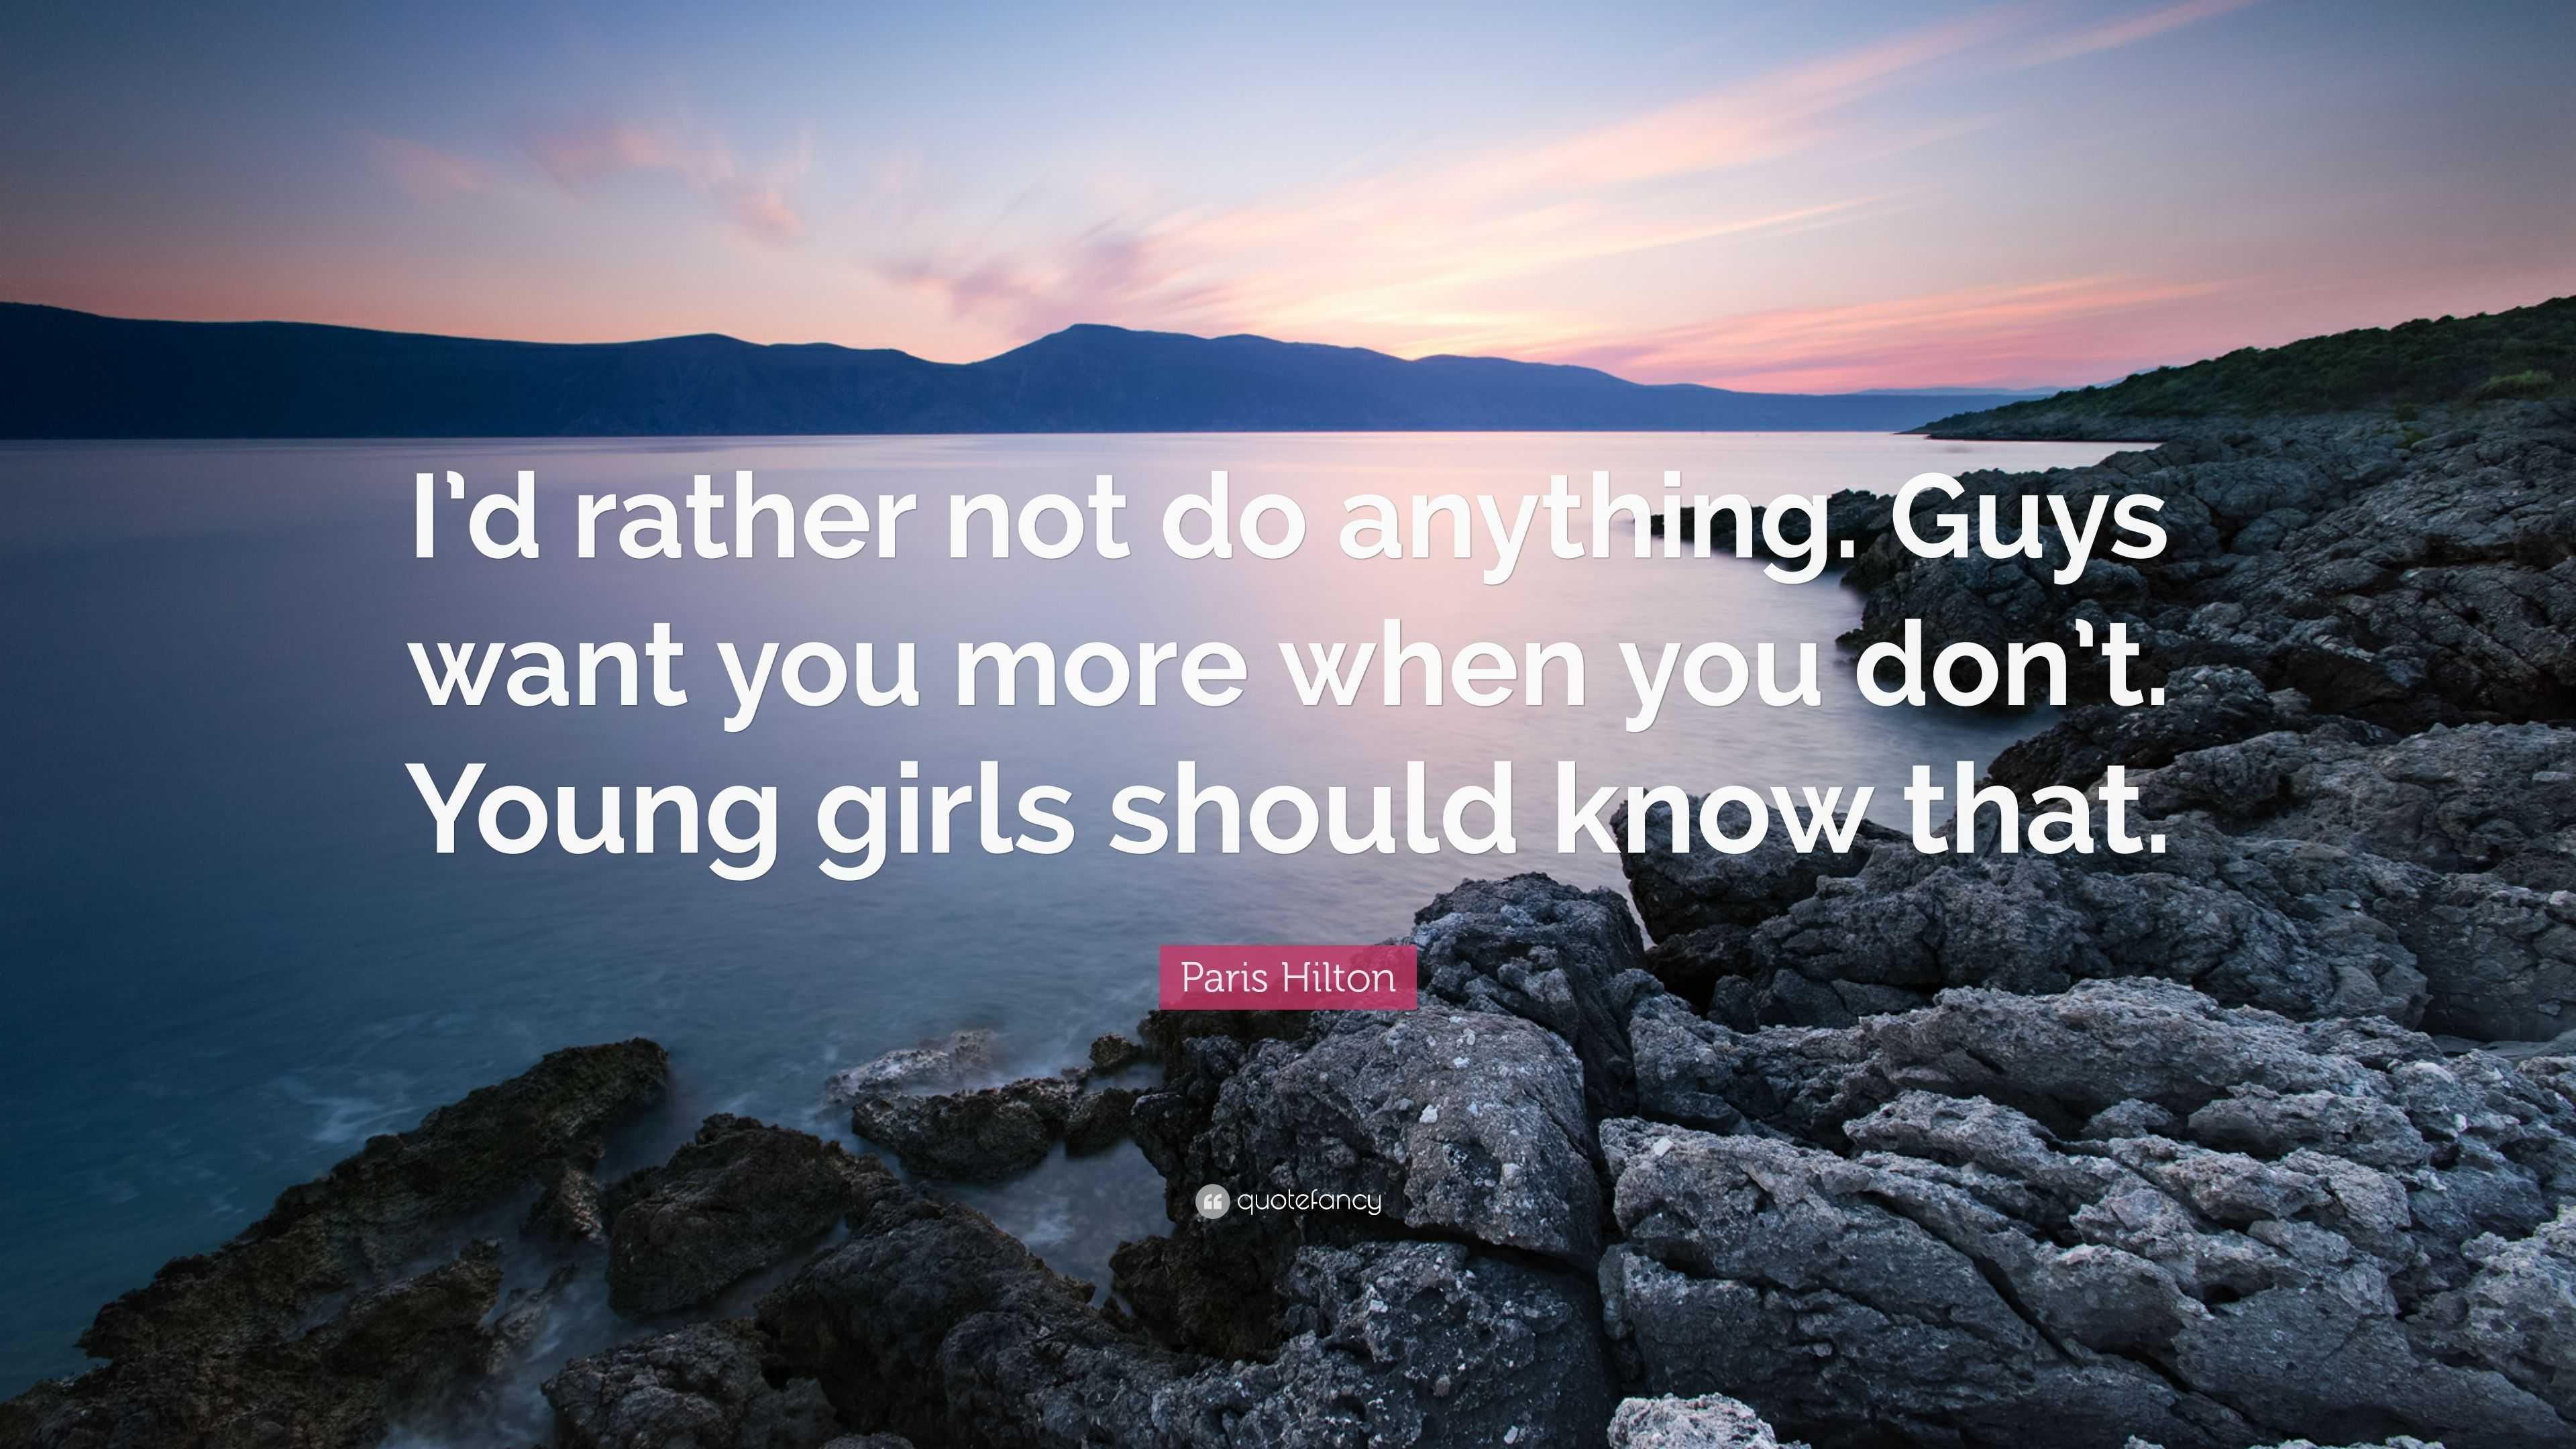 Guys girls what do want to Guys, Listen